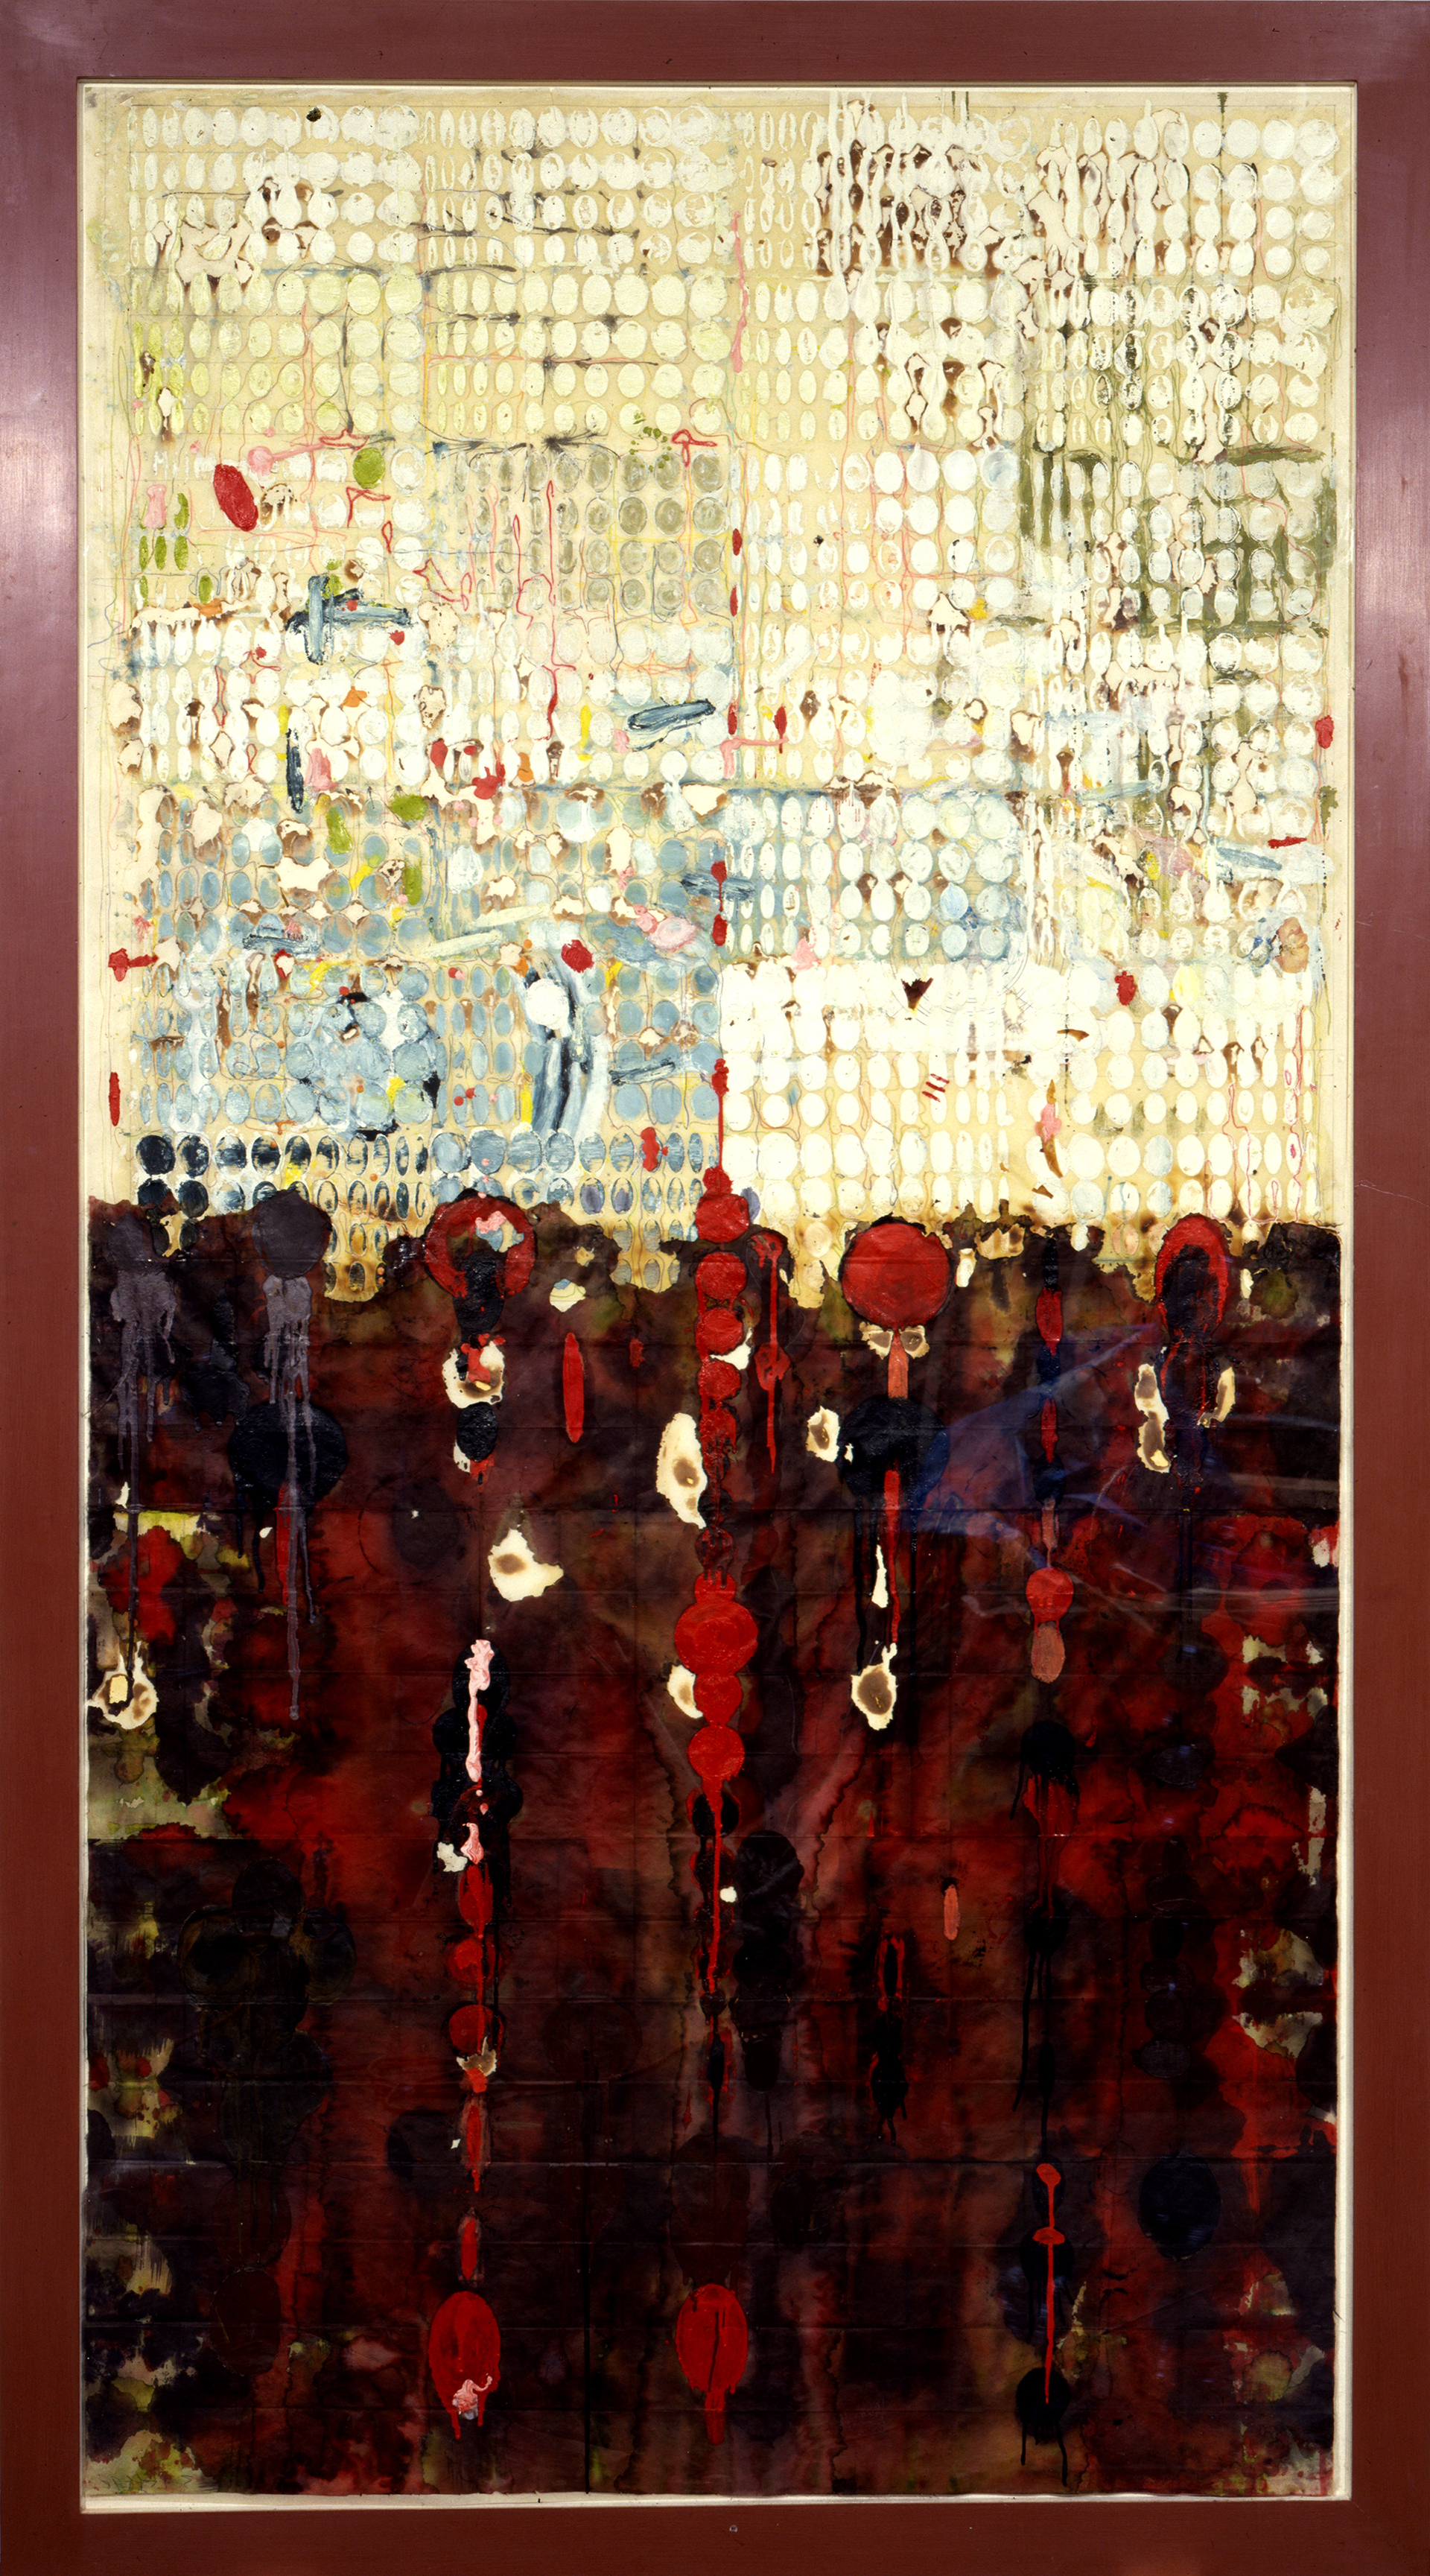 Oil & Water, 1999